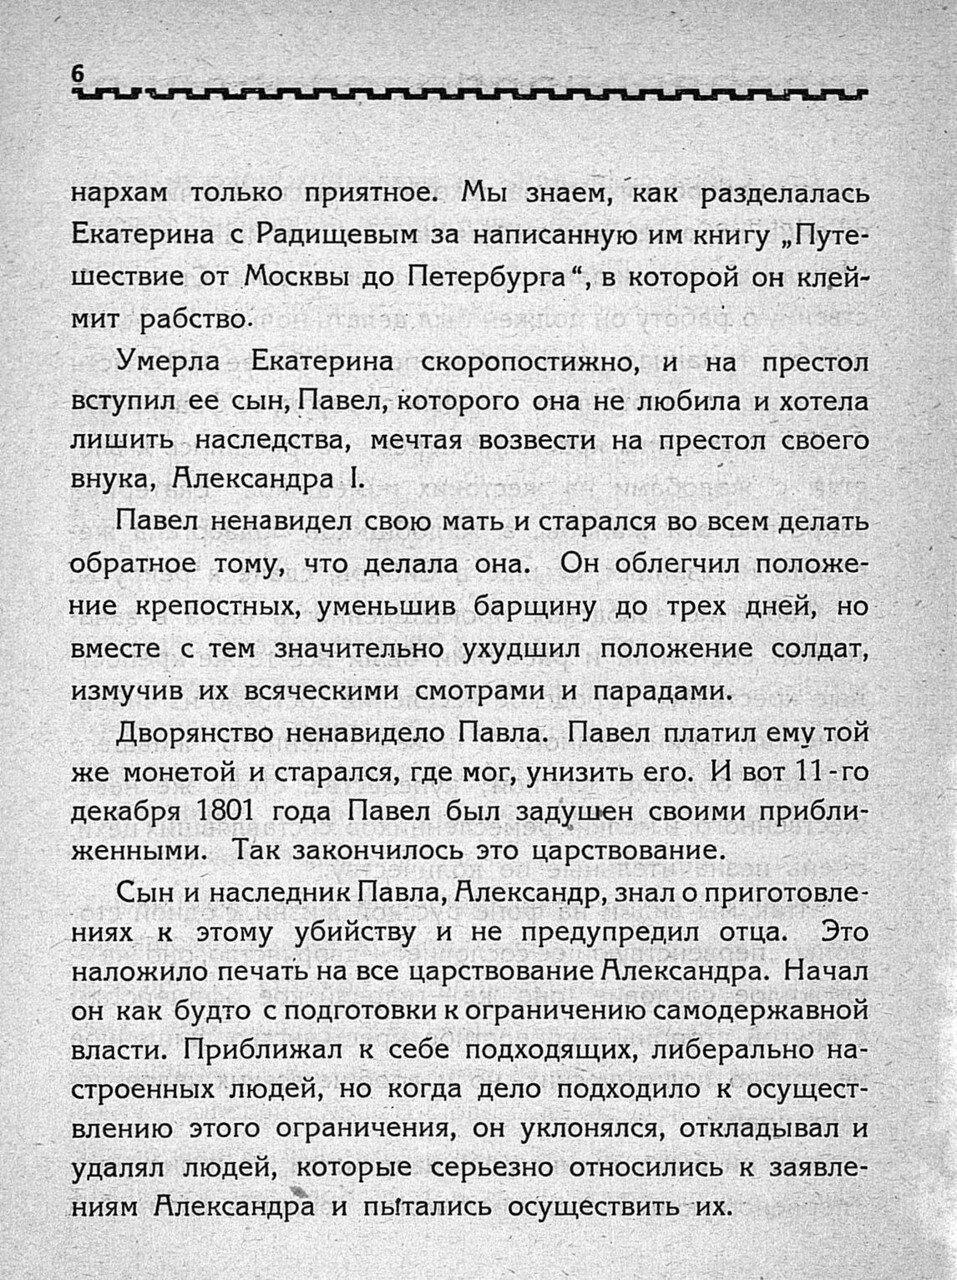 https://img-fotki.yandex.ru/get/112407/199368979.23/0_1bfaca_5691cd6_XXXL.jpg